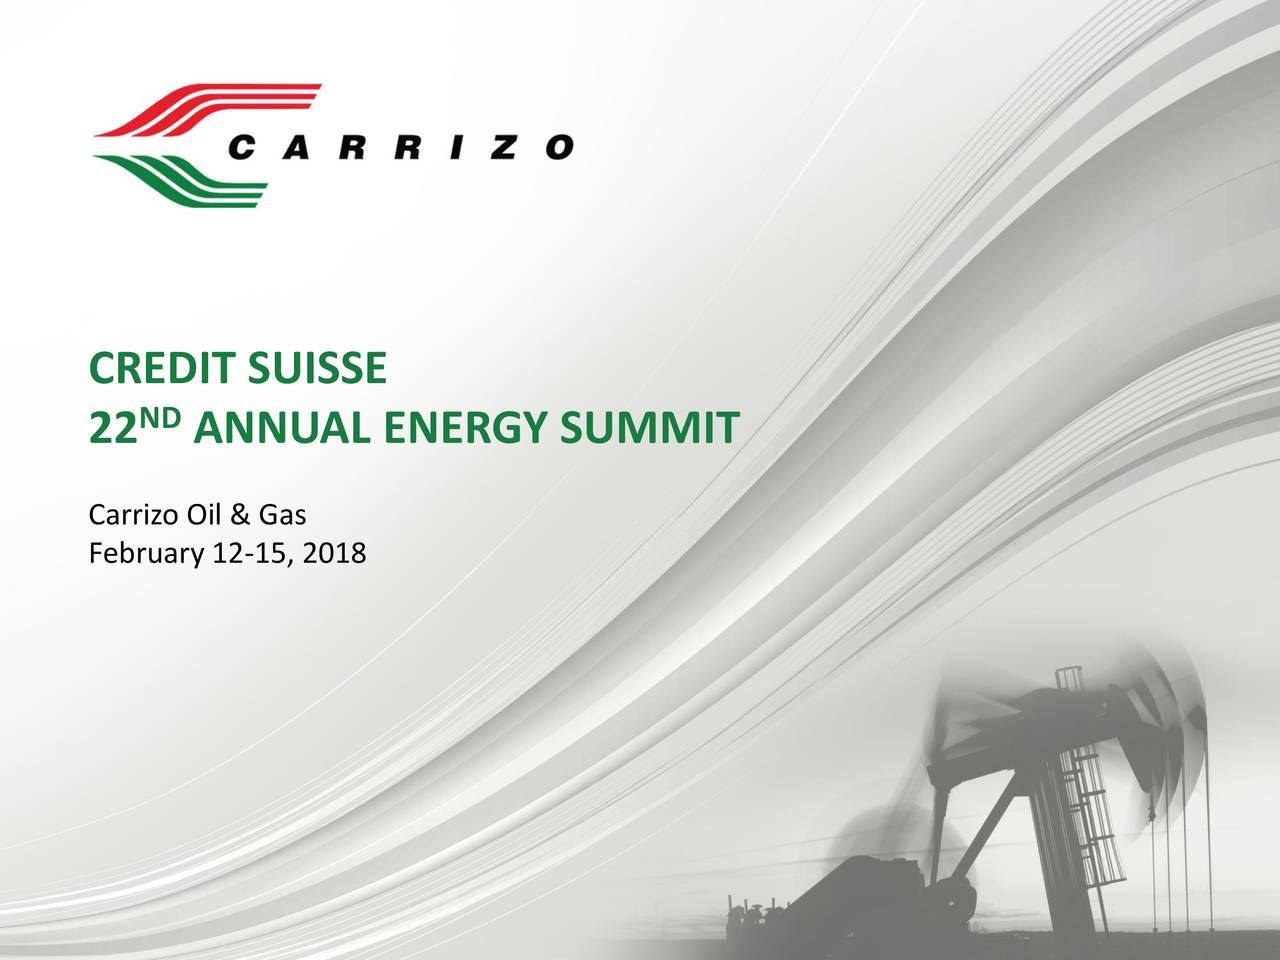 22 NDANNUAL ENERGY SUMMIT Carrizo Oil & Gas February 12-15, 2018